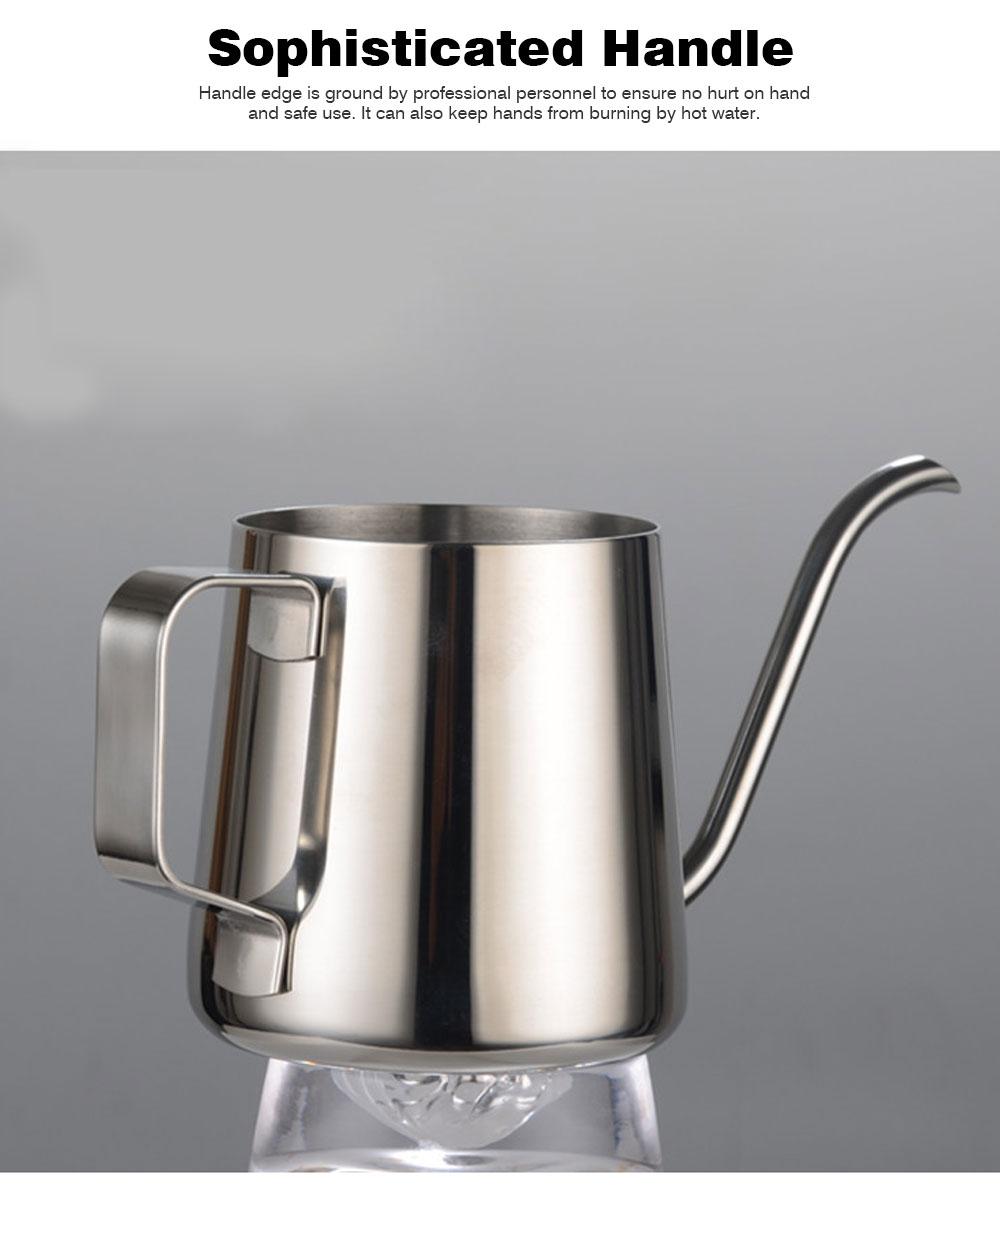 Stainless Steel Drip Coffee Maker Hand Drip Coffee Pot Narrow-mouthed Drip Coffee Urn Long Mouth Teflon Coffee Maker 5